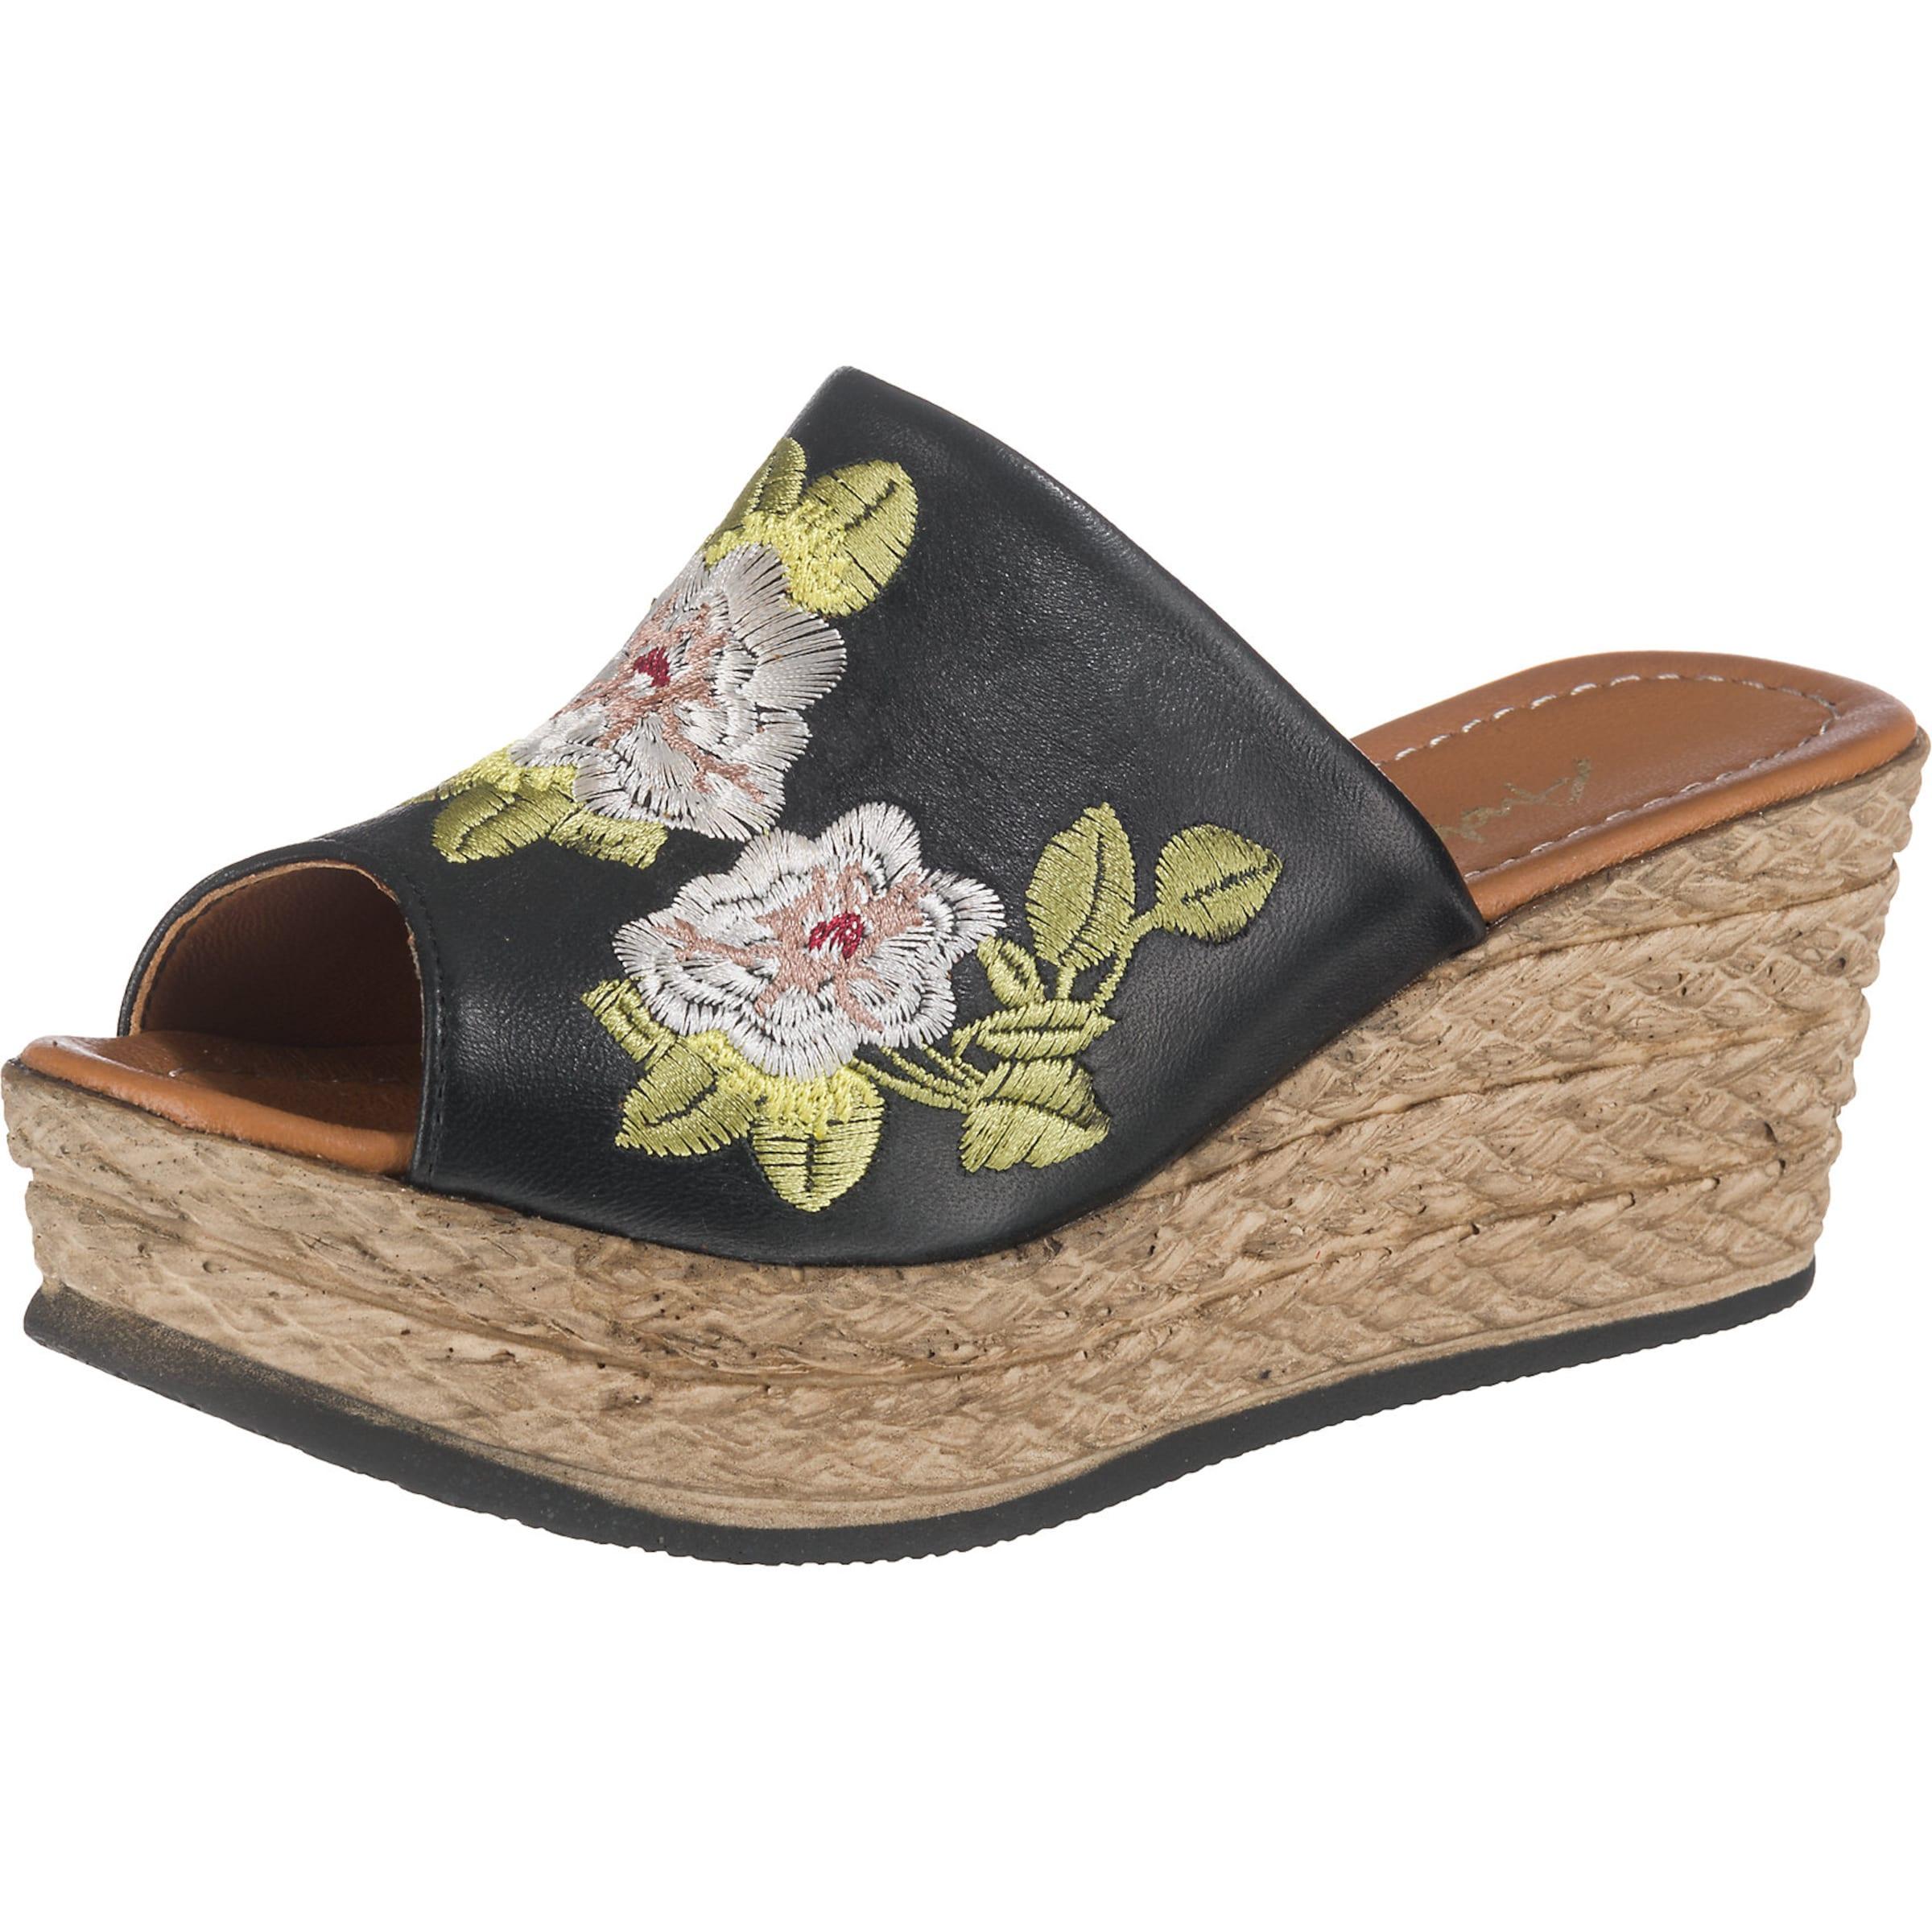 ANDREA CONTI Plateau-Pantoletten Verschleißfeste billige Schuhe